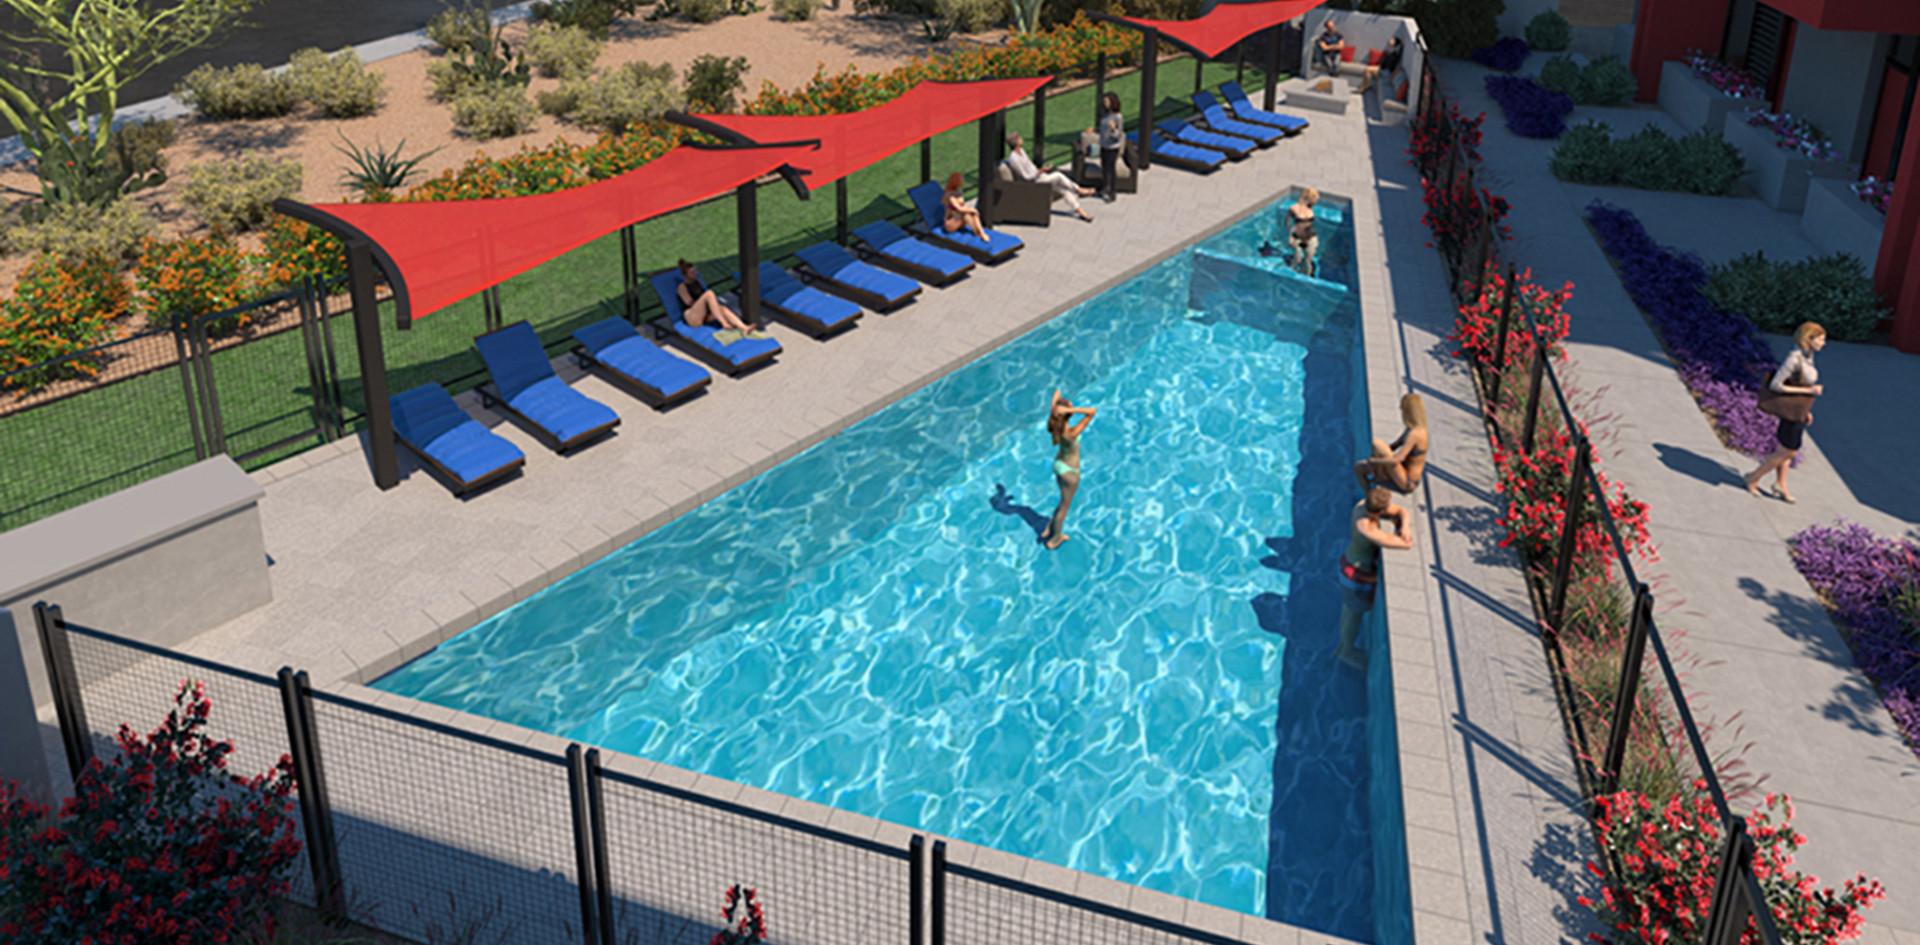 Soho-pool-1.jpg